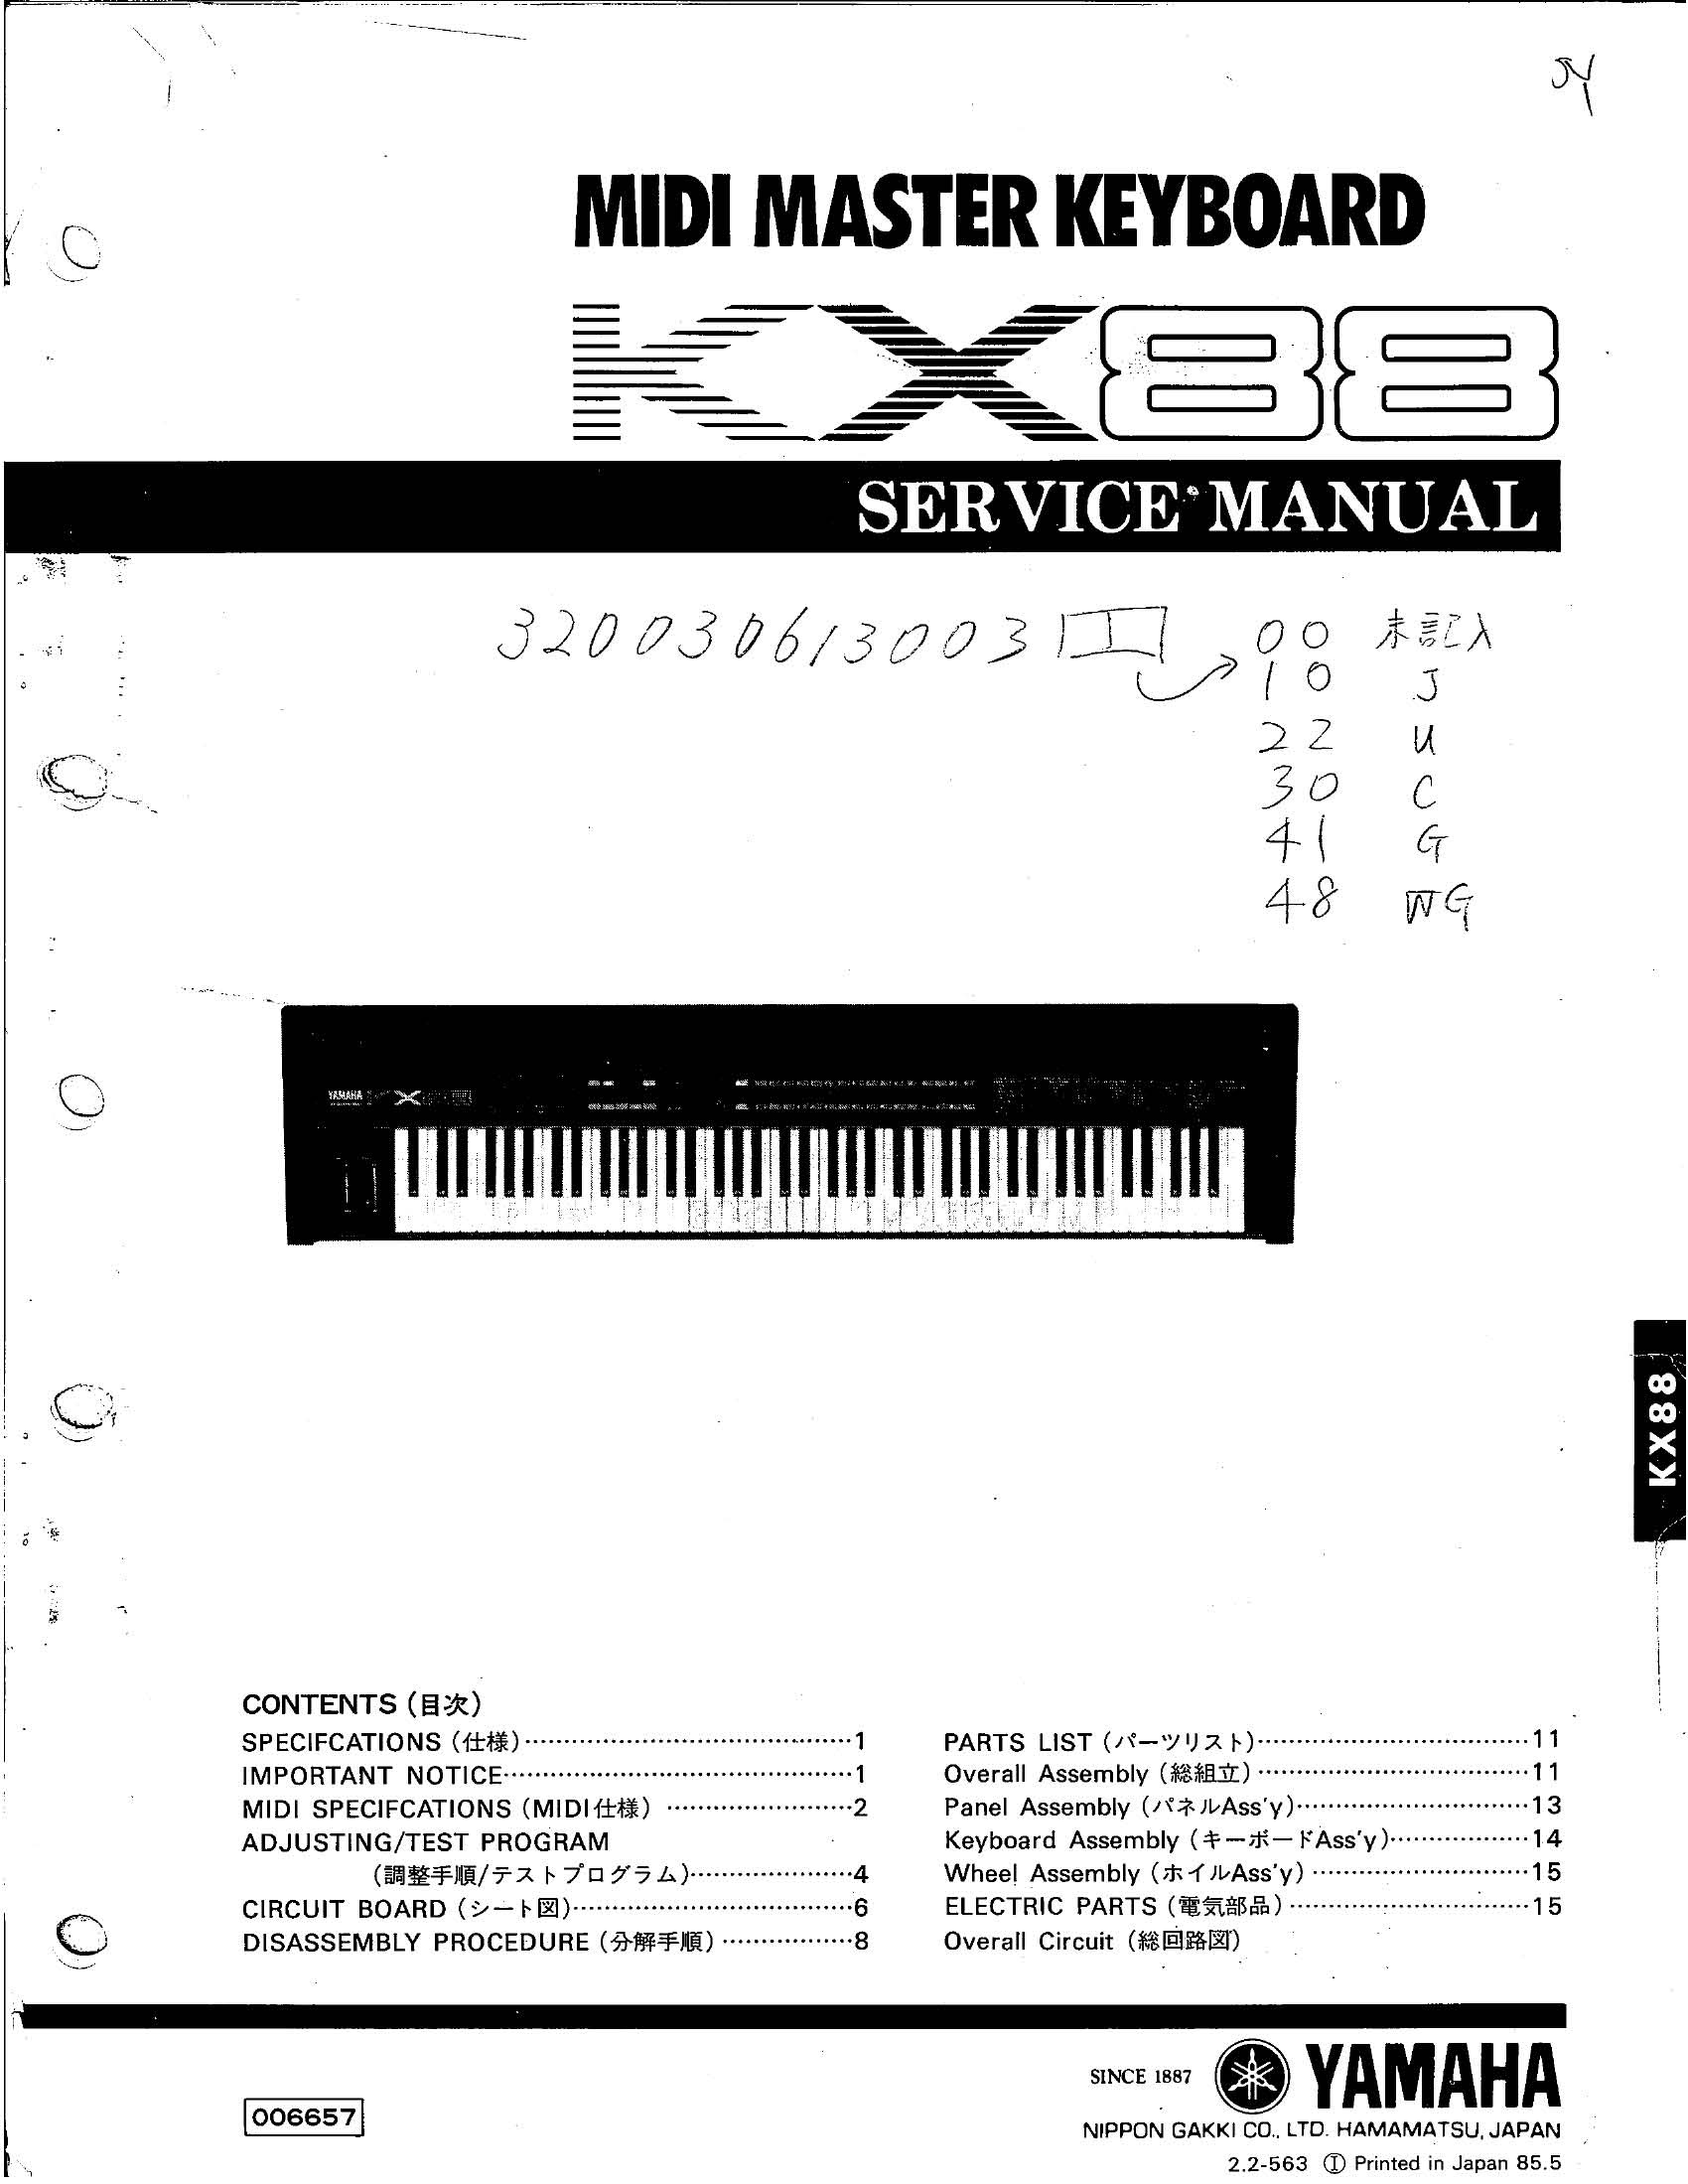 yamaha kx88 service manual music manuals rh sellfy com kx88 service manual Service ManualsOnline